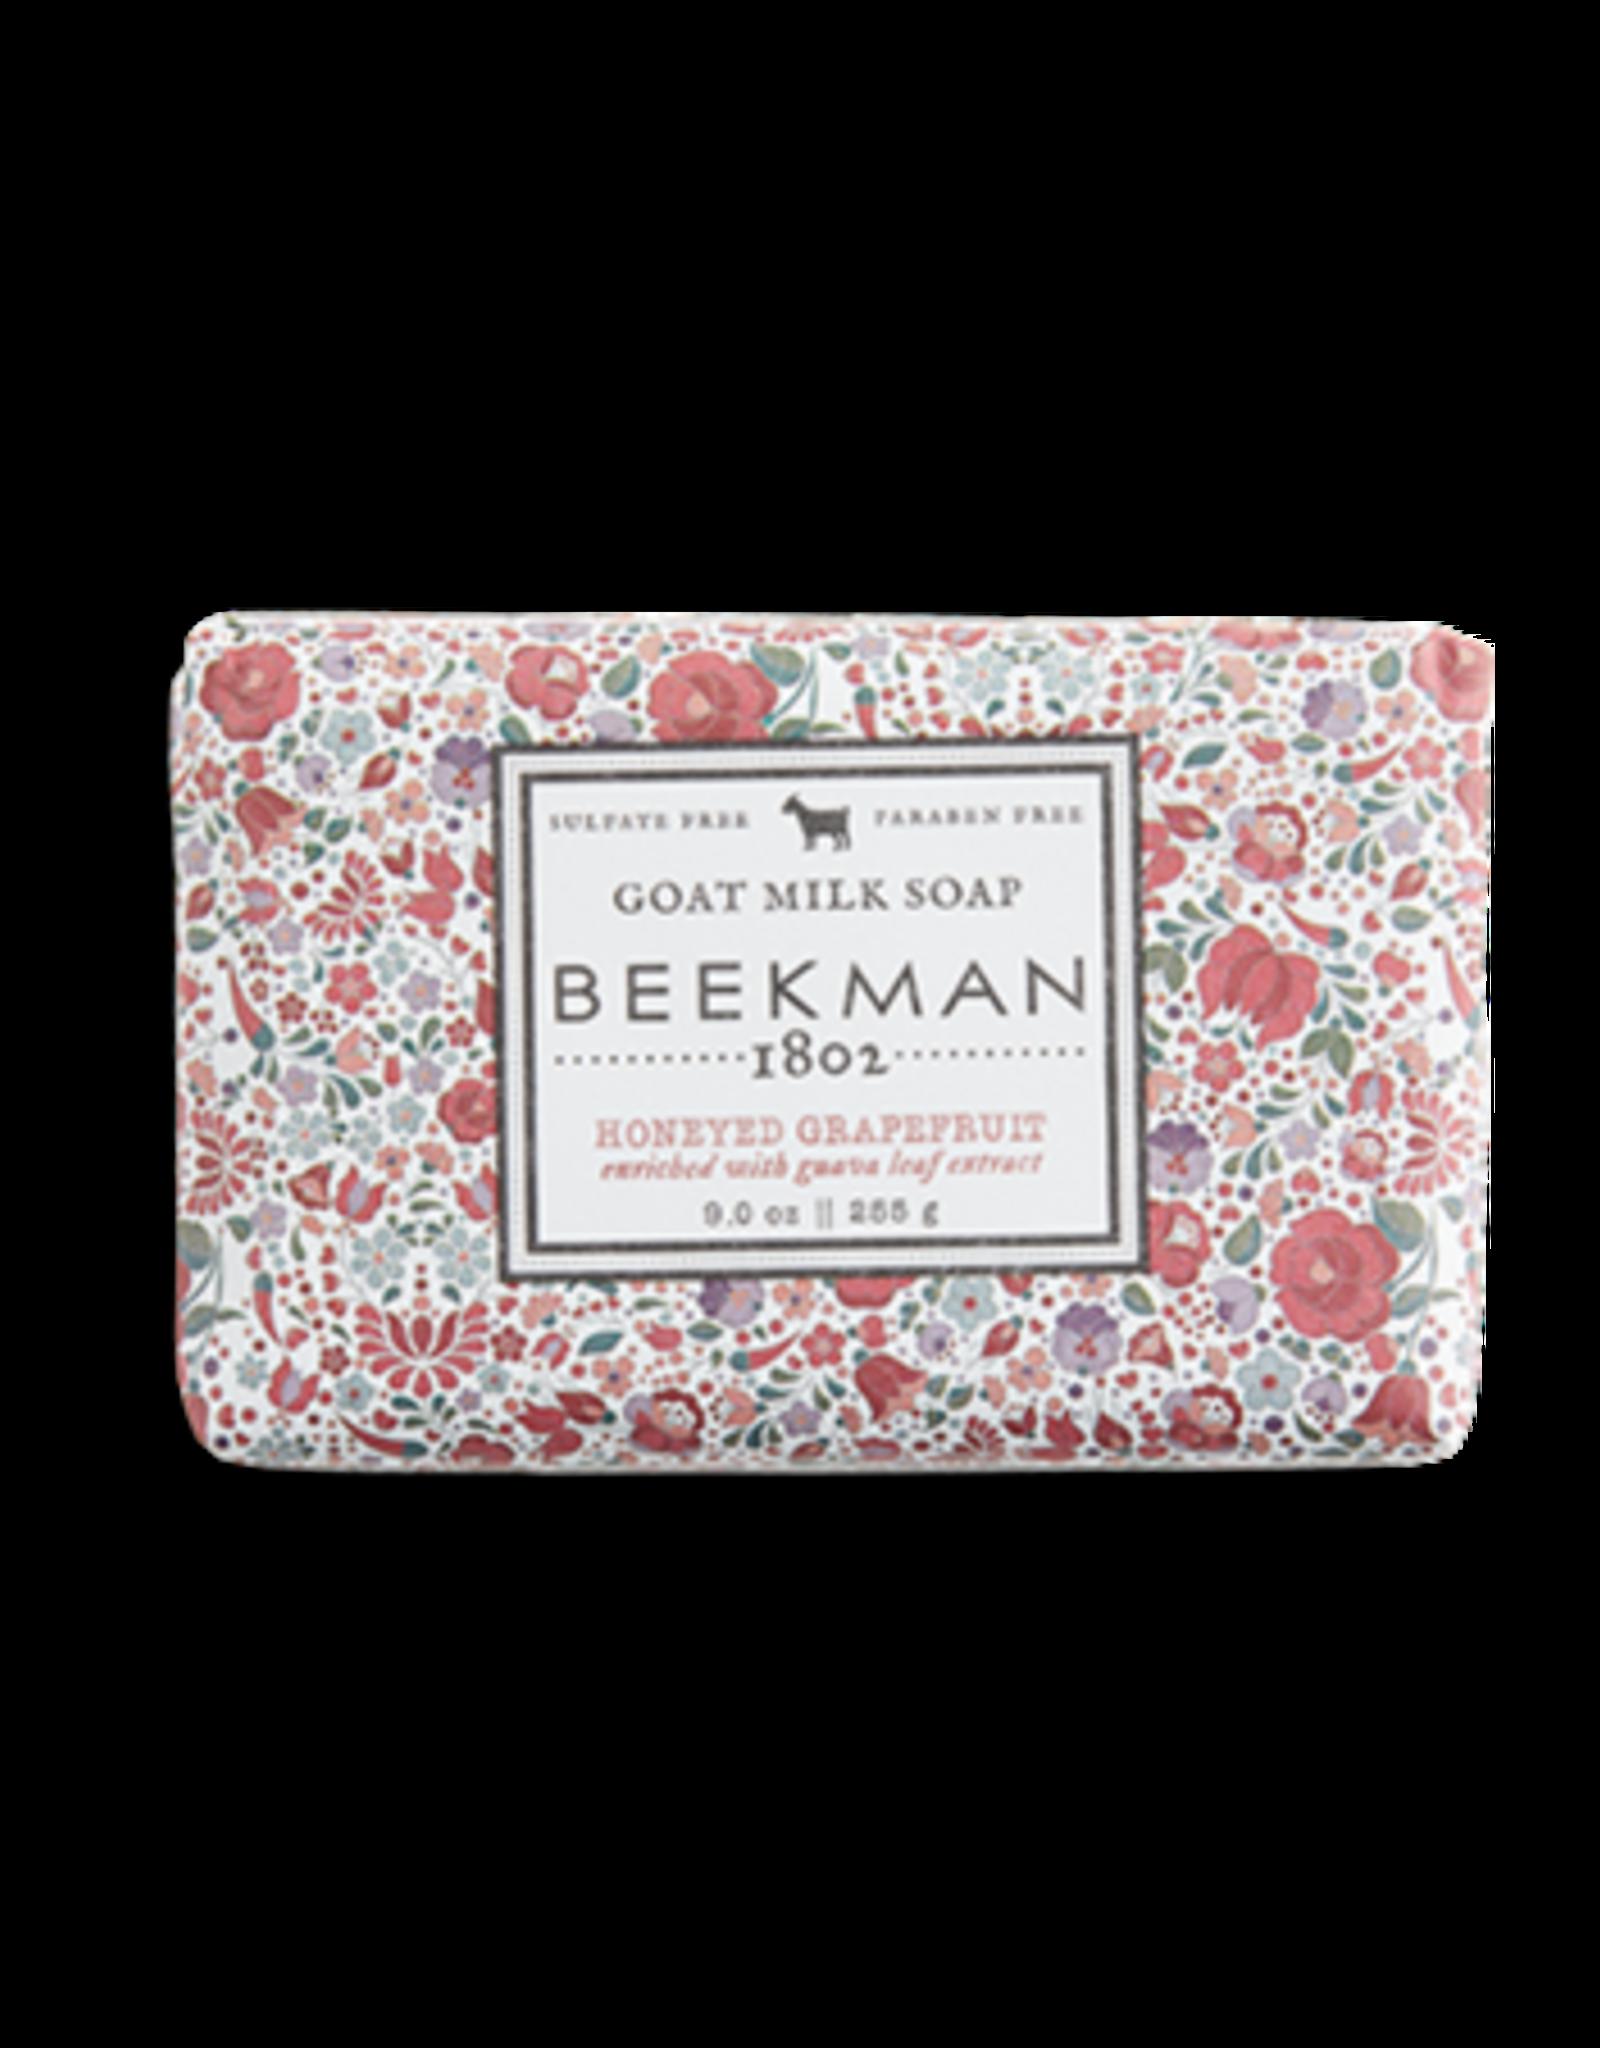 Beekman 1802 Beekman 1802 Goat Milk Hand Cream Honeyed Grapefruit